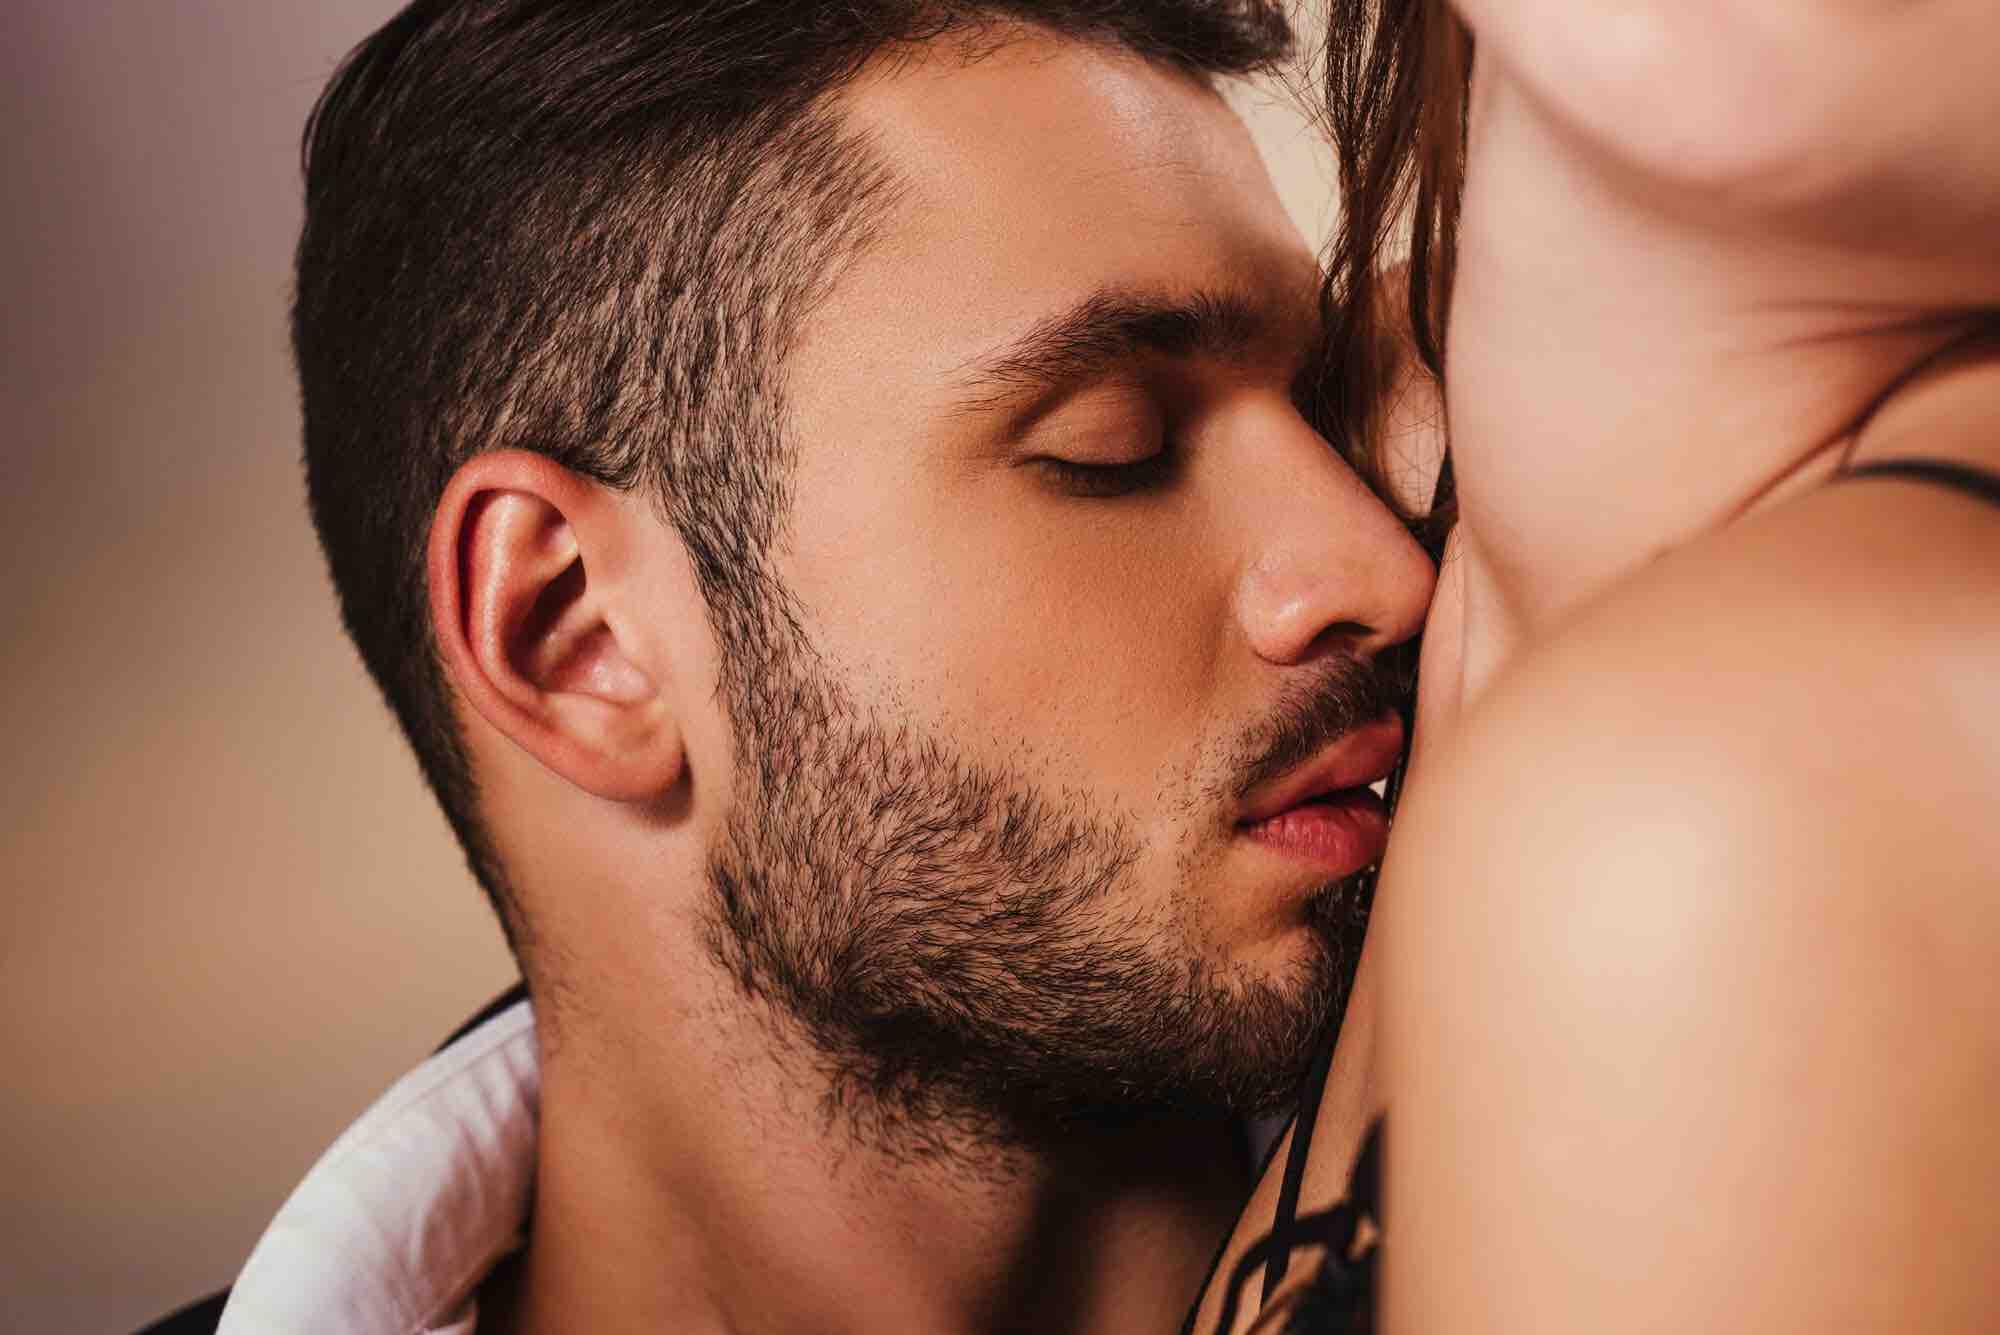 test-na-seksualnost